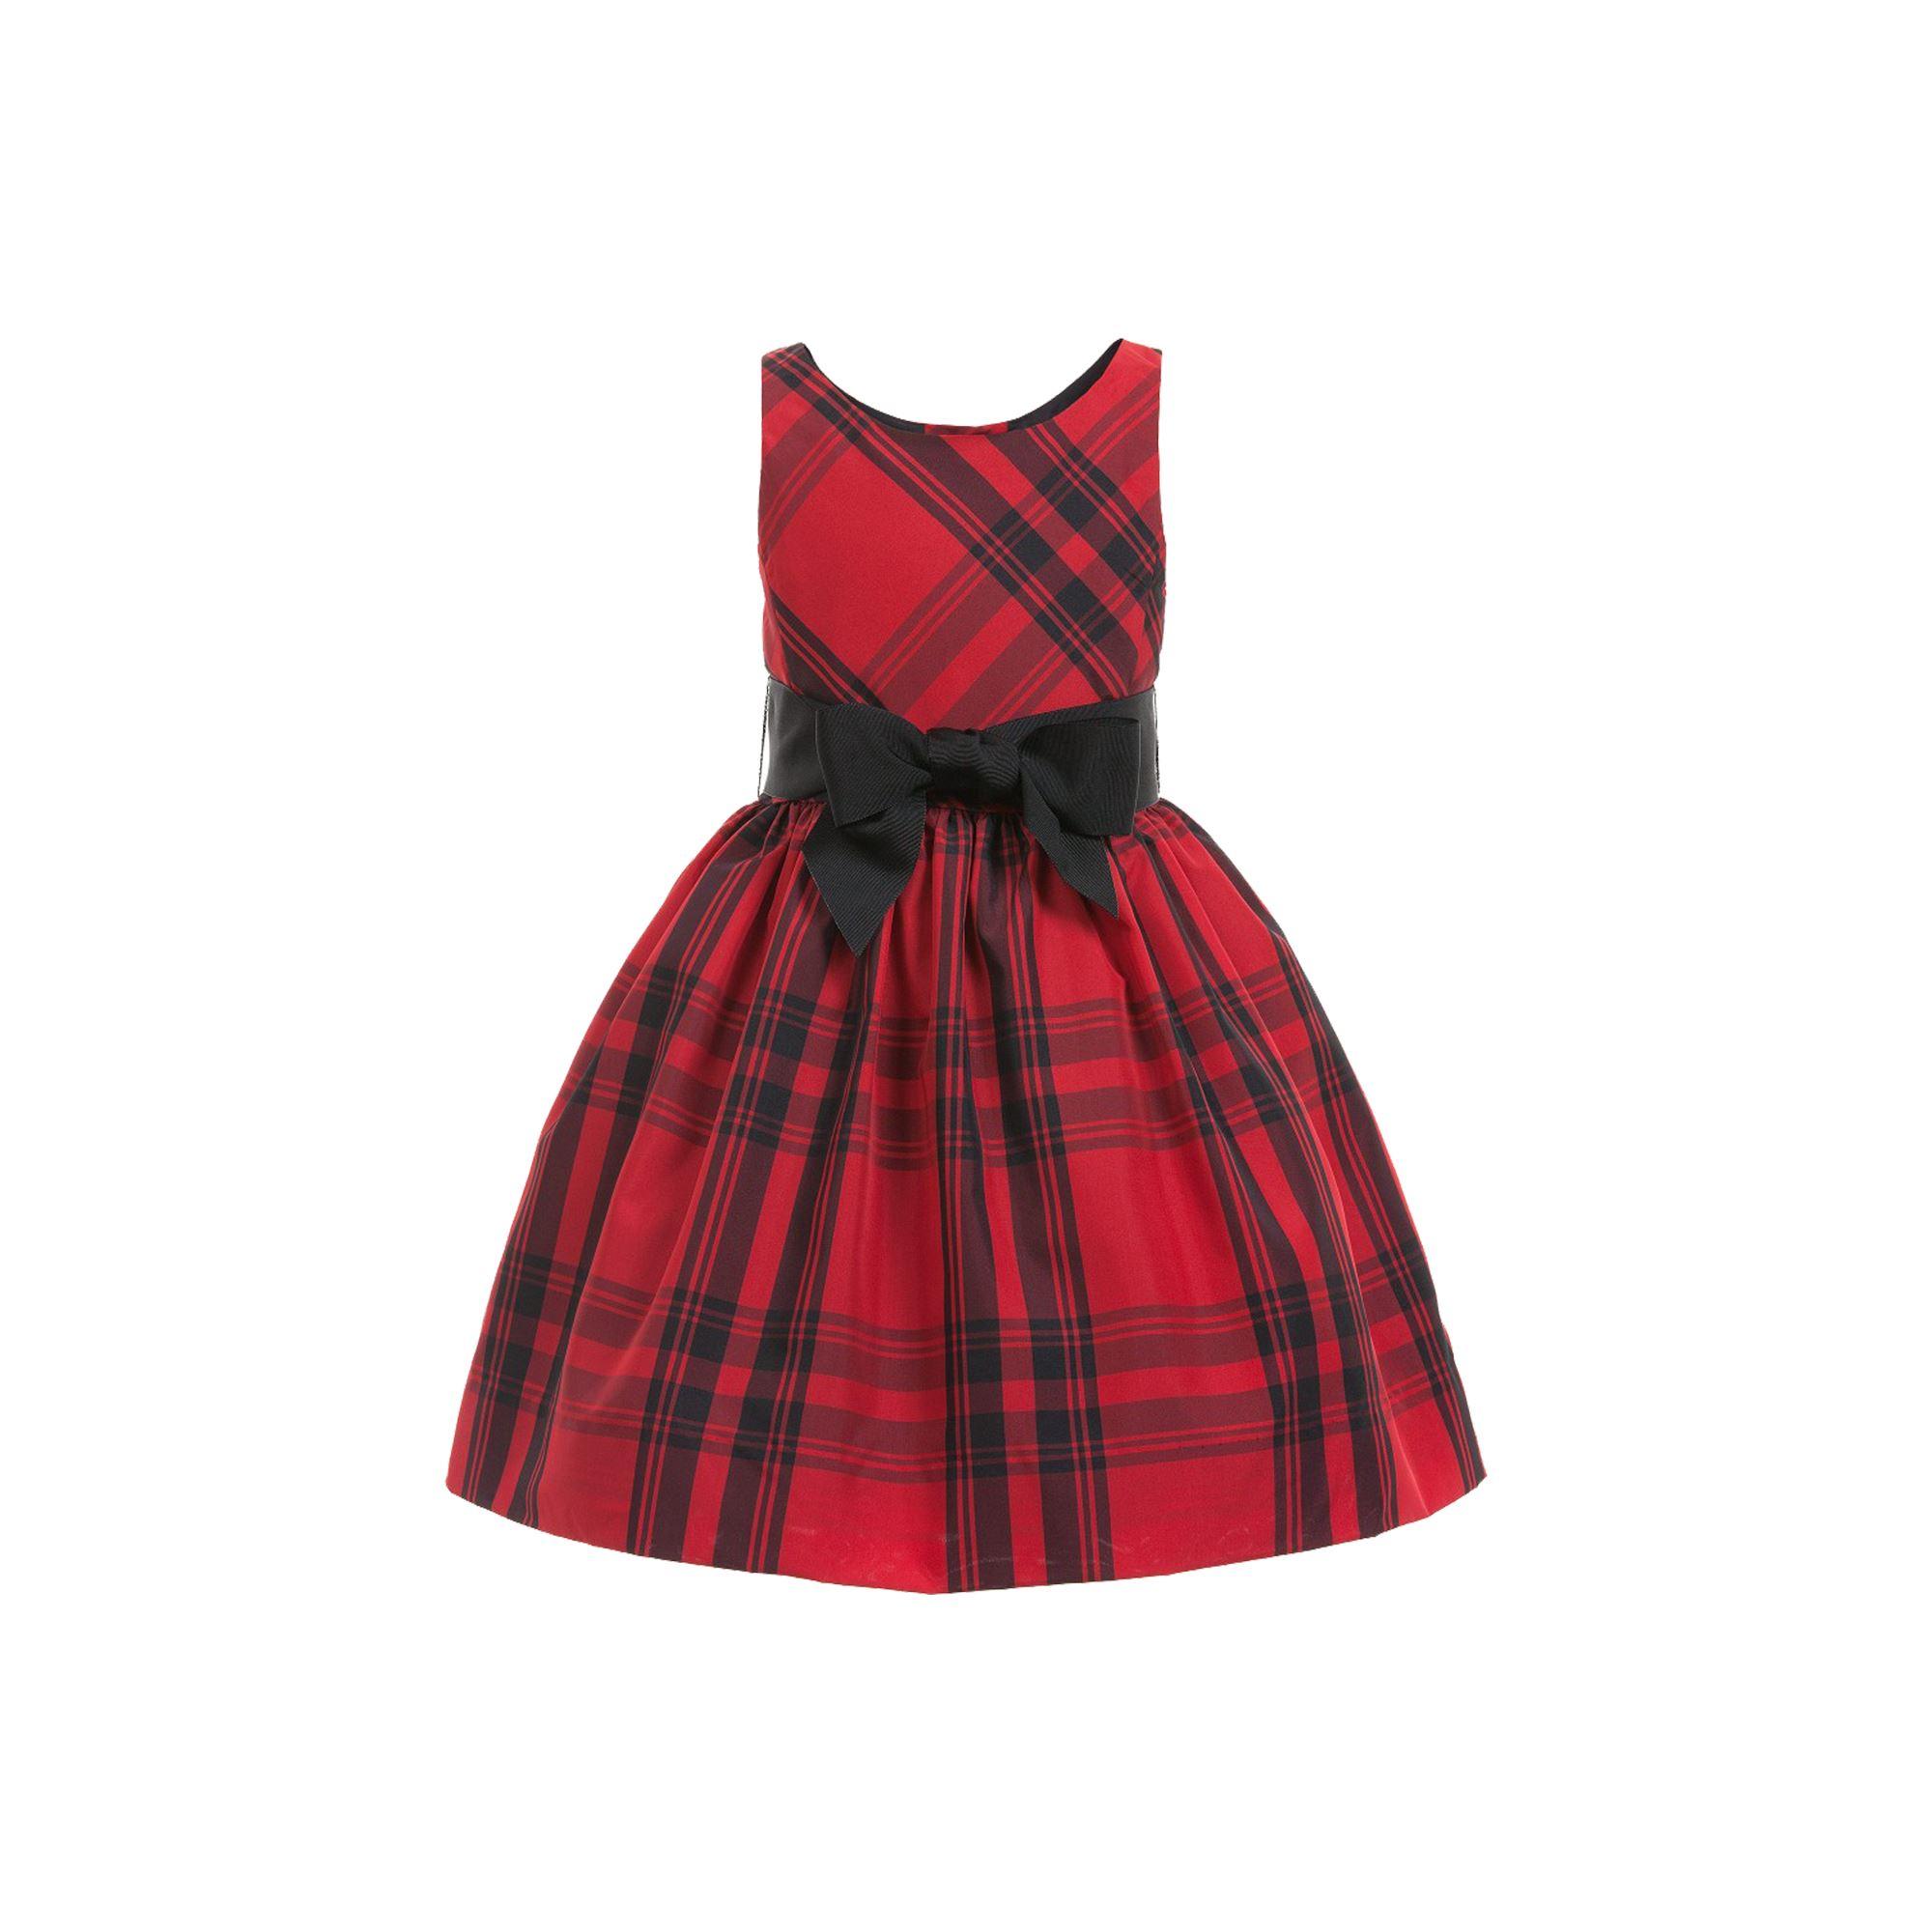 Designer • Arrivals Brands Ralph Brand New From Lauren Polo 6f7yYgb